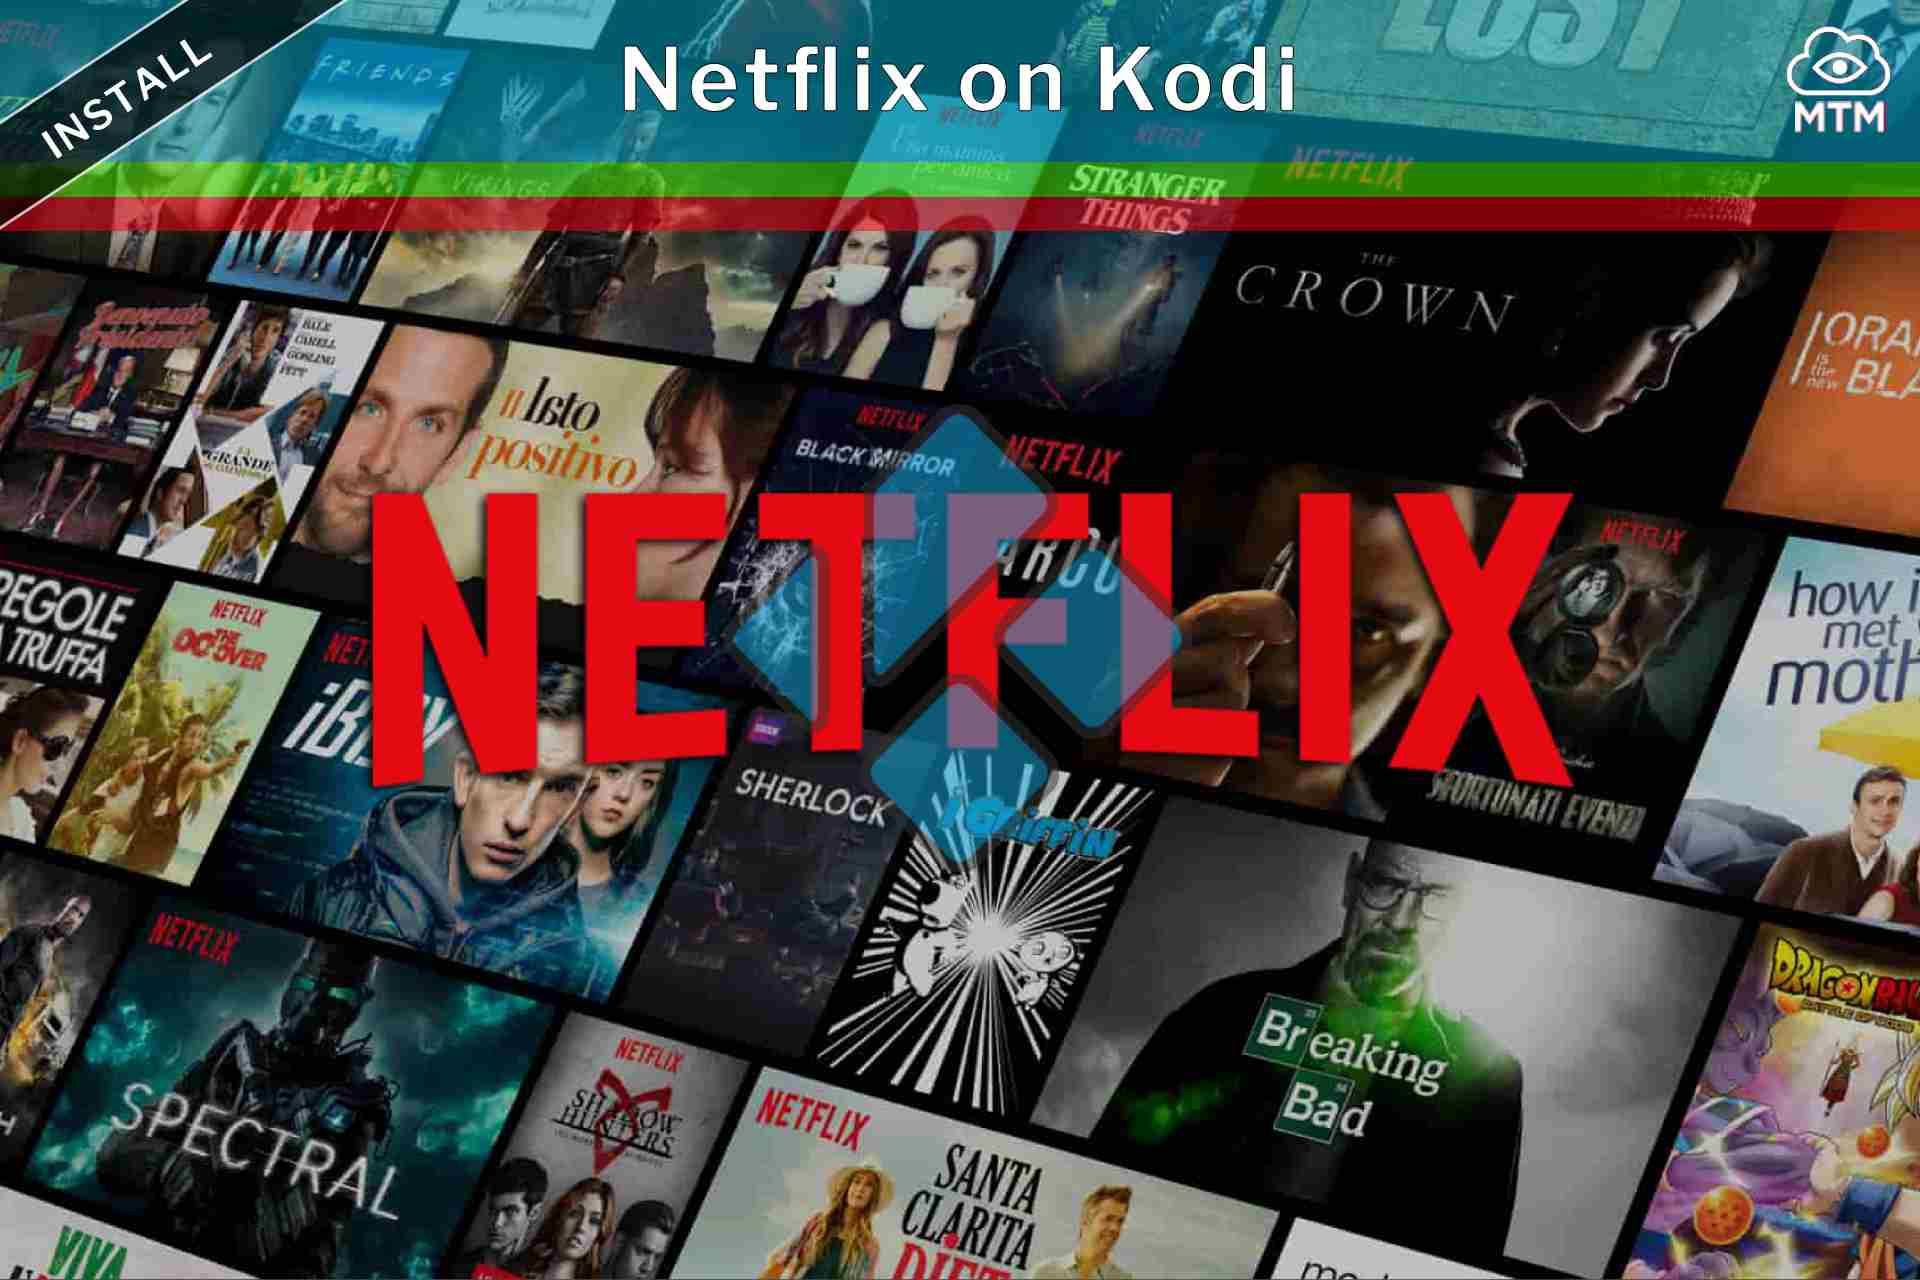 How to Install & Watch Netflix Kodi 18 Leia Addon